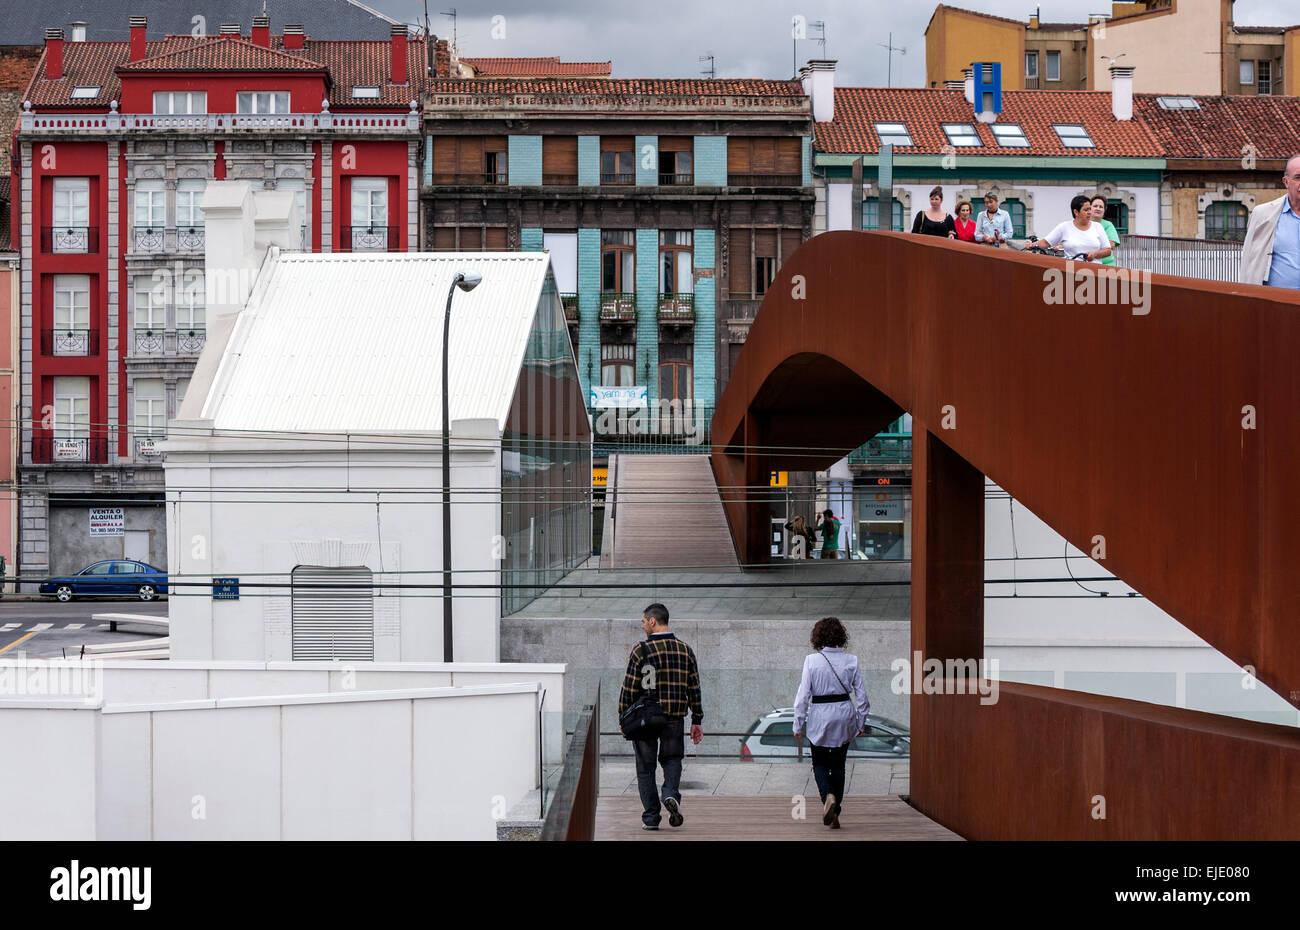 Bridge oxide from The Oscar Niemeyer International Cultural Centre to Aviles city center, Asturias, Spain Stock Photo